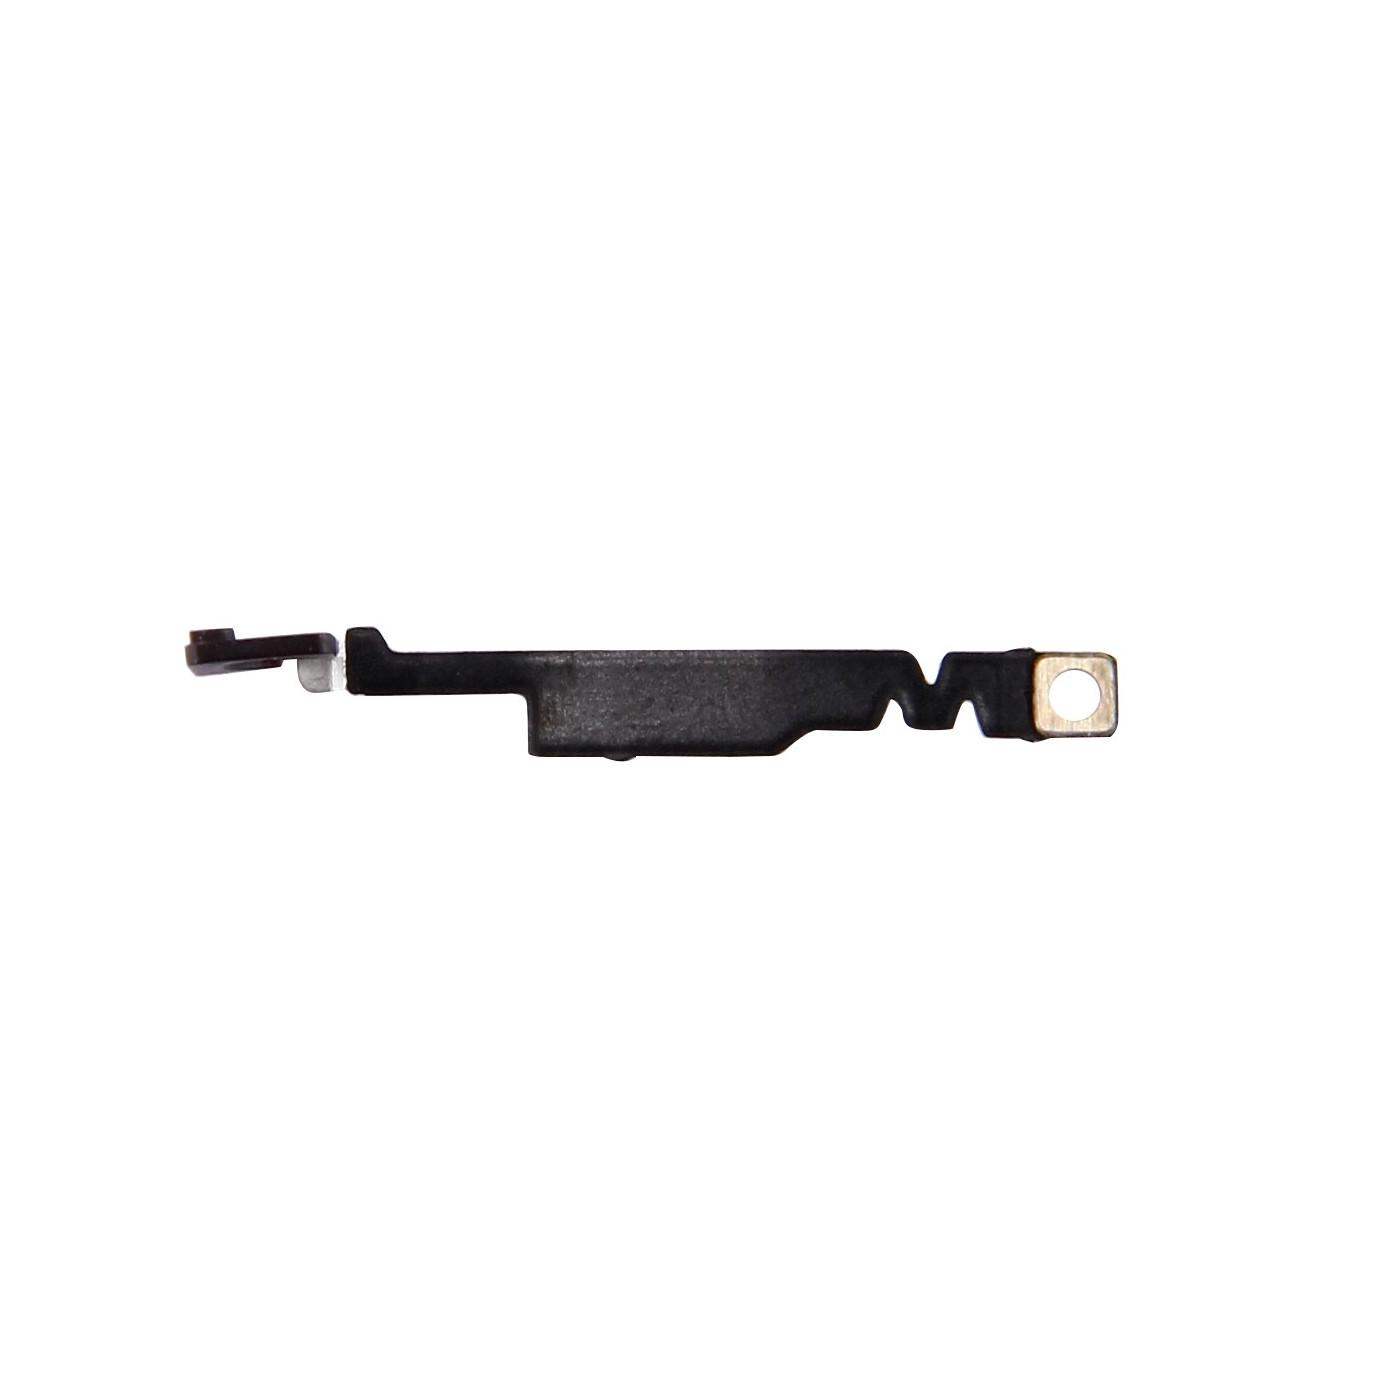 Antena de señal Bluetooth para iPhone 7 plus Flex Cable